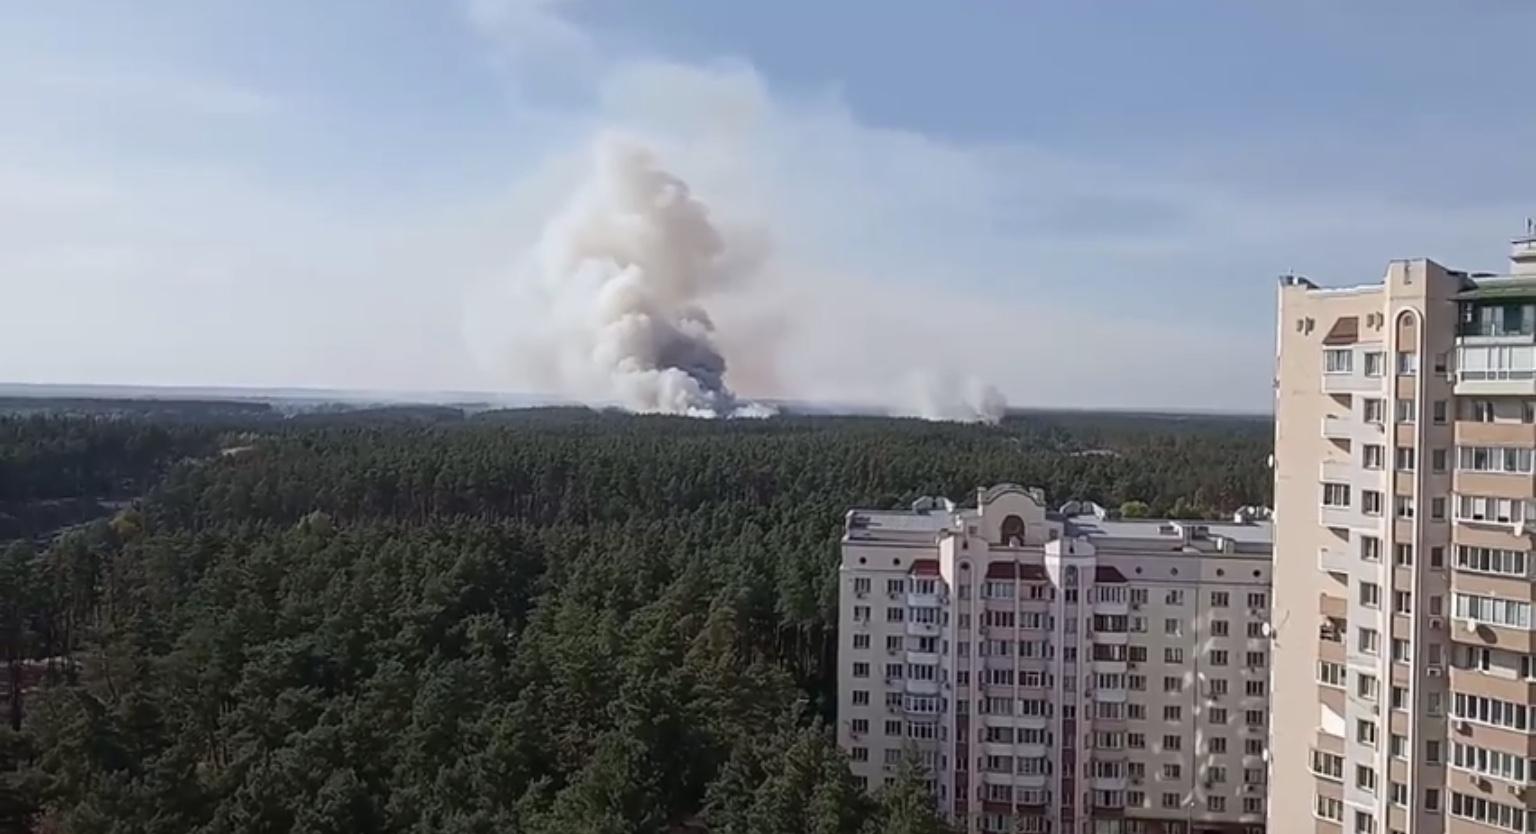 3AD63AA3-1A6C-4952-BBBA-9BDBCB4E35AA В Українці горить ліс за Стугною